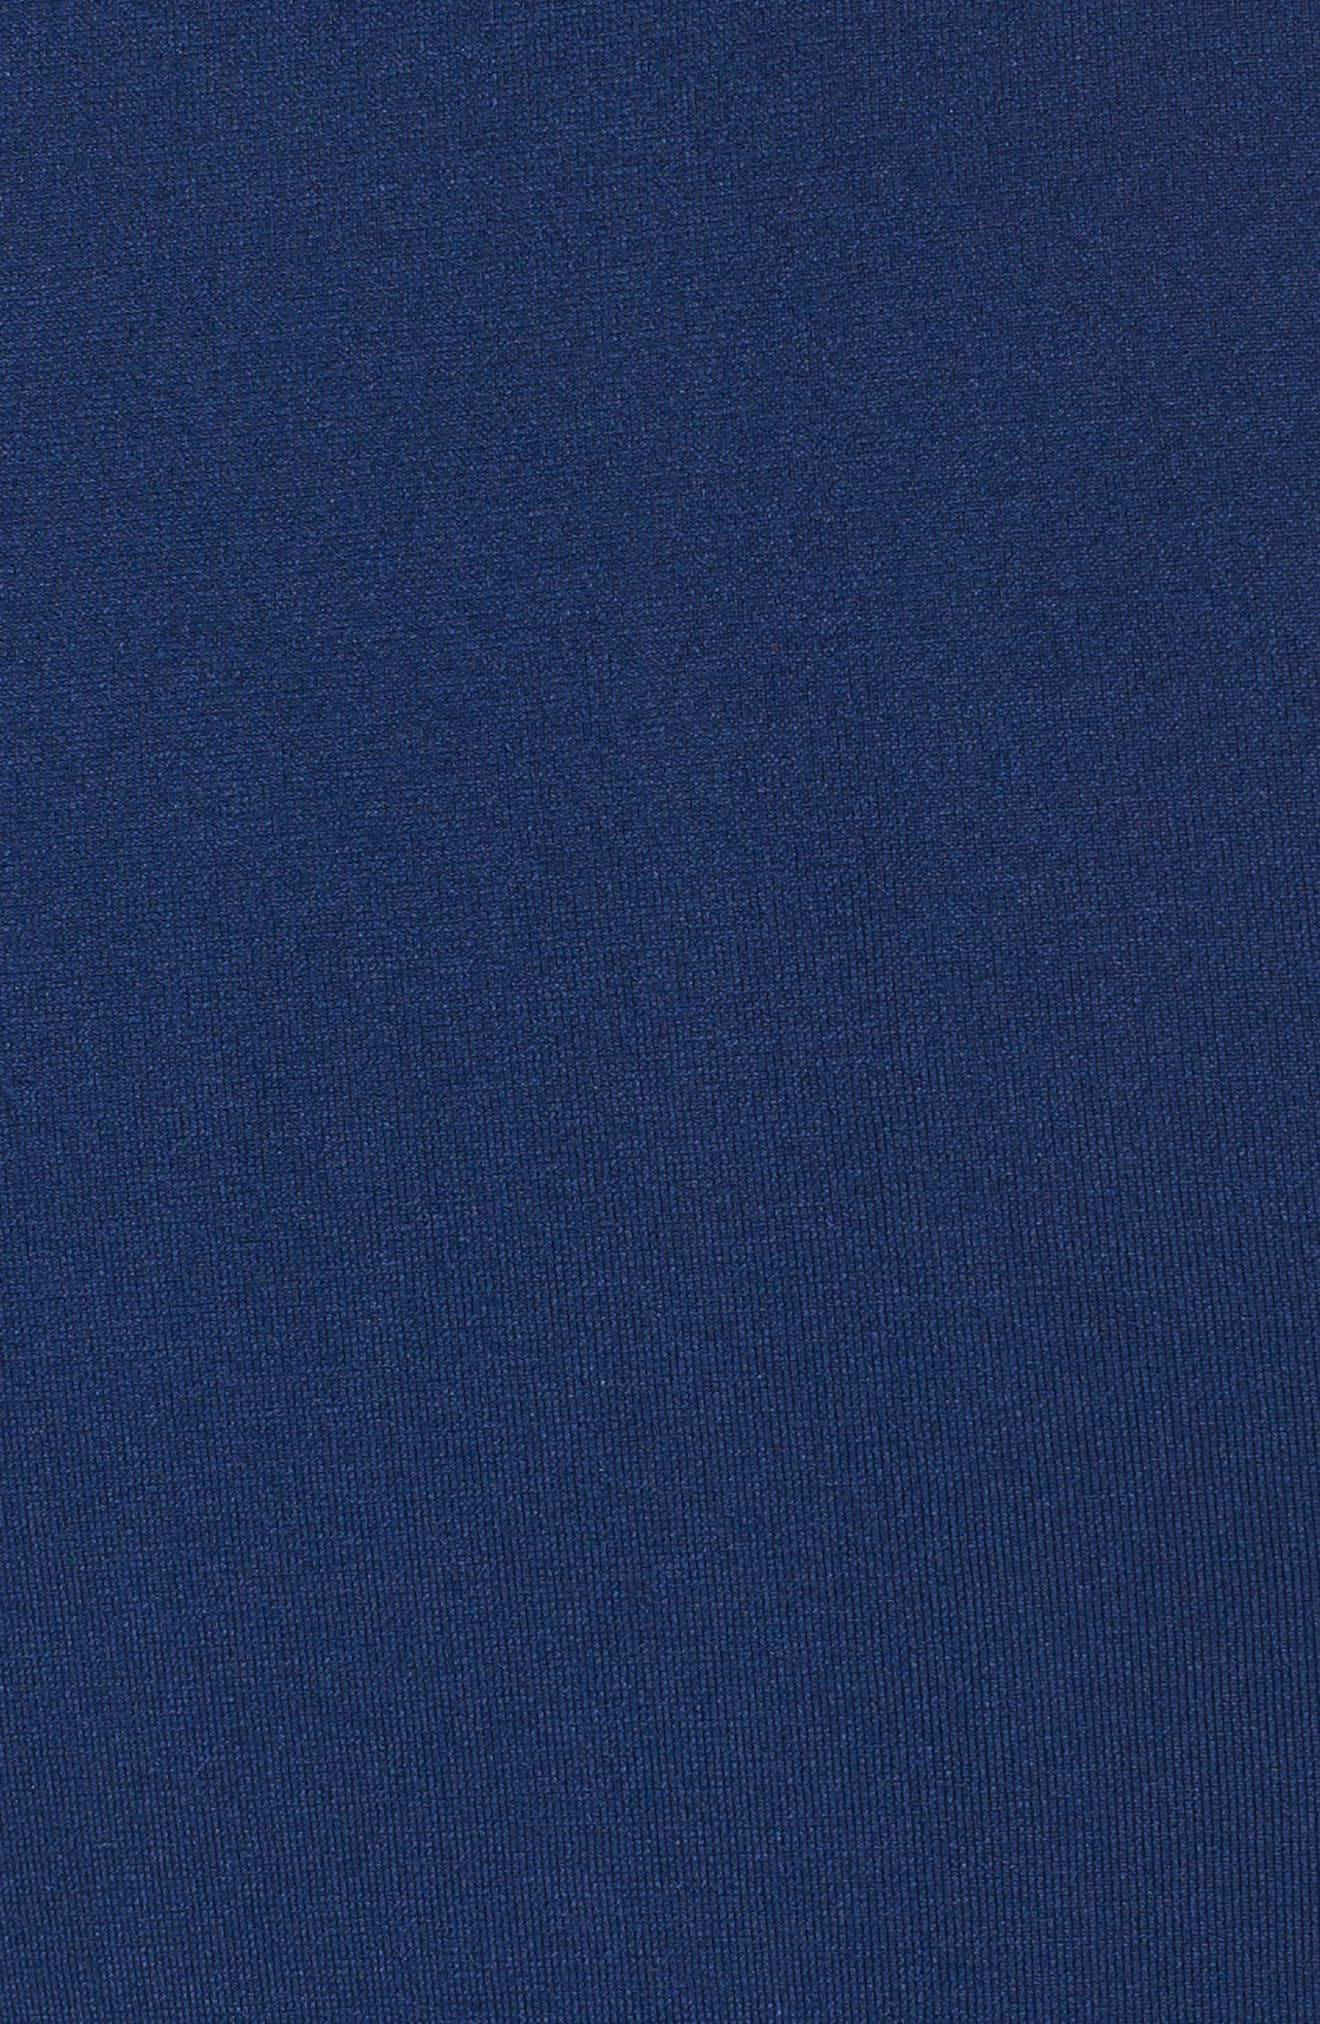 Finish Line Training Jacket,                             Alternate thumbnail 6, color,                             Estate Blue And Crystal Pink